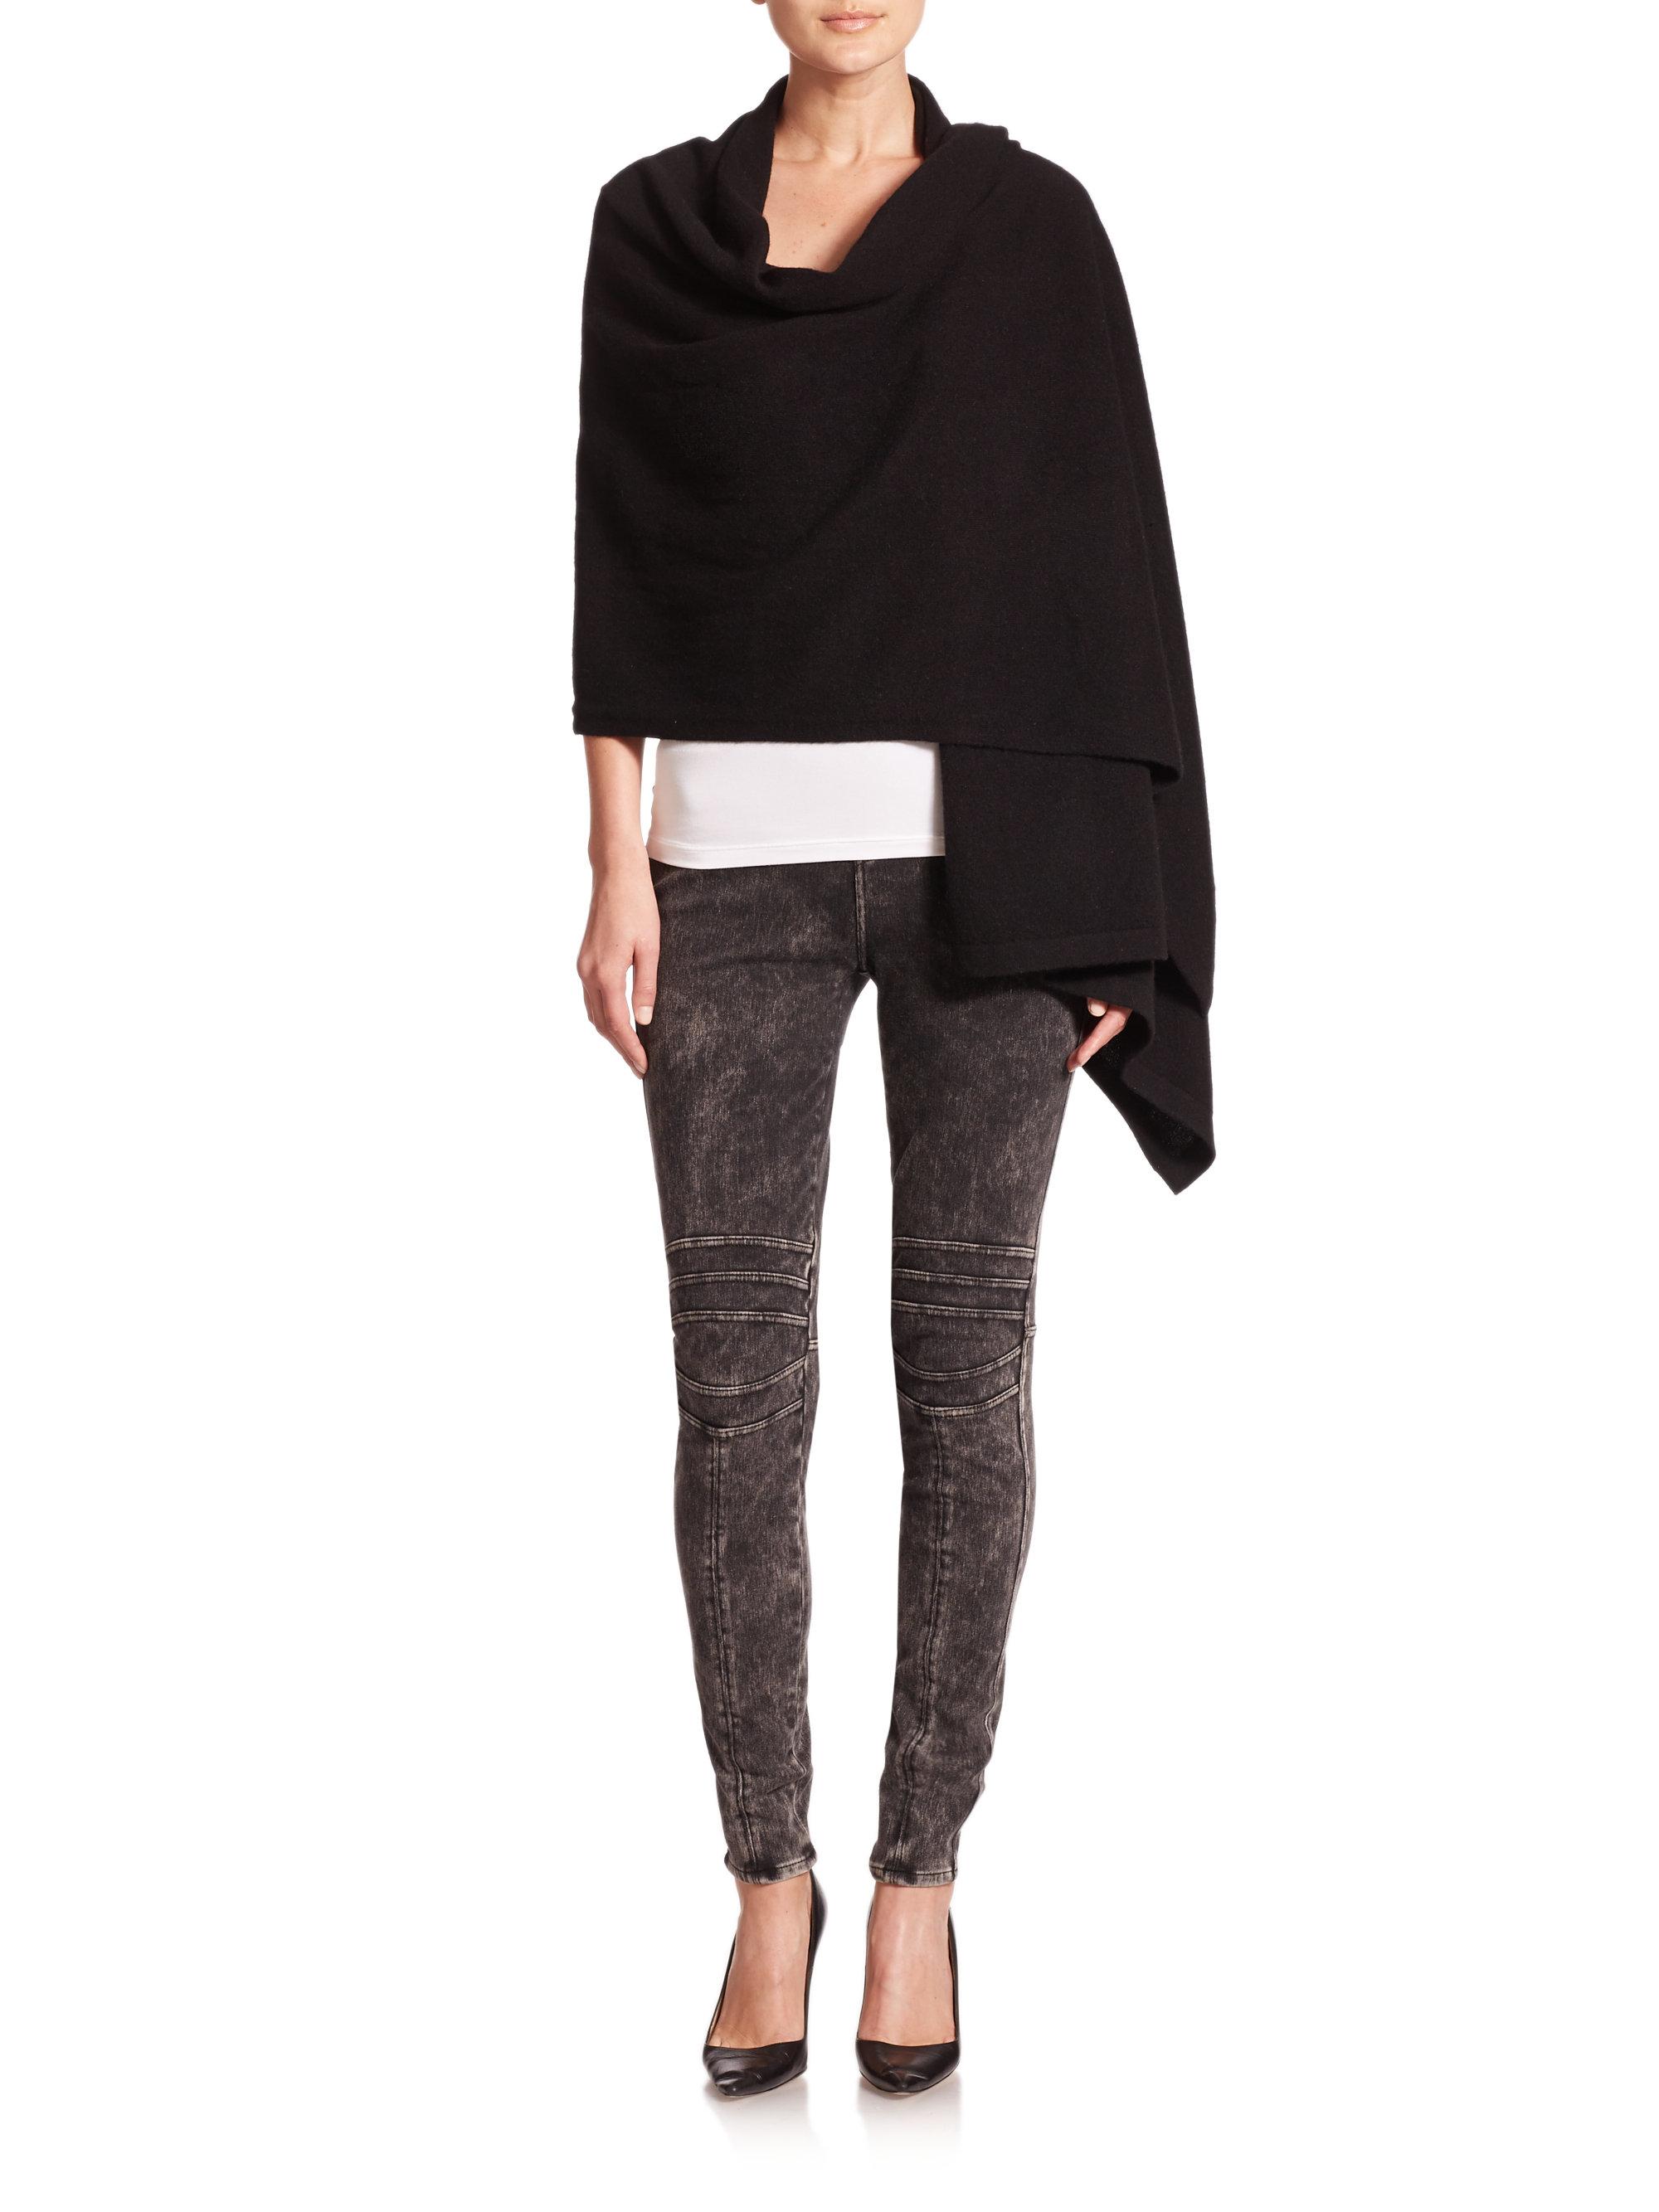 Neiman Marcus Cashmere Sweater